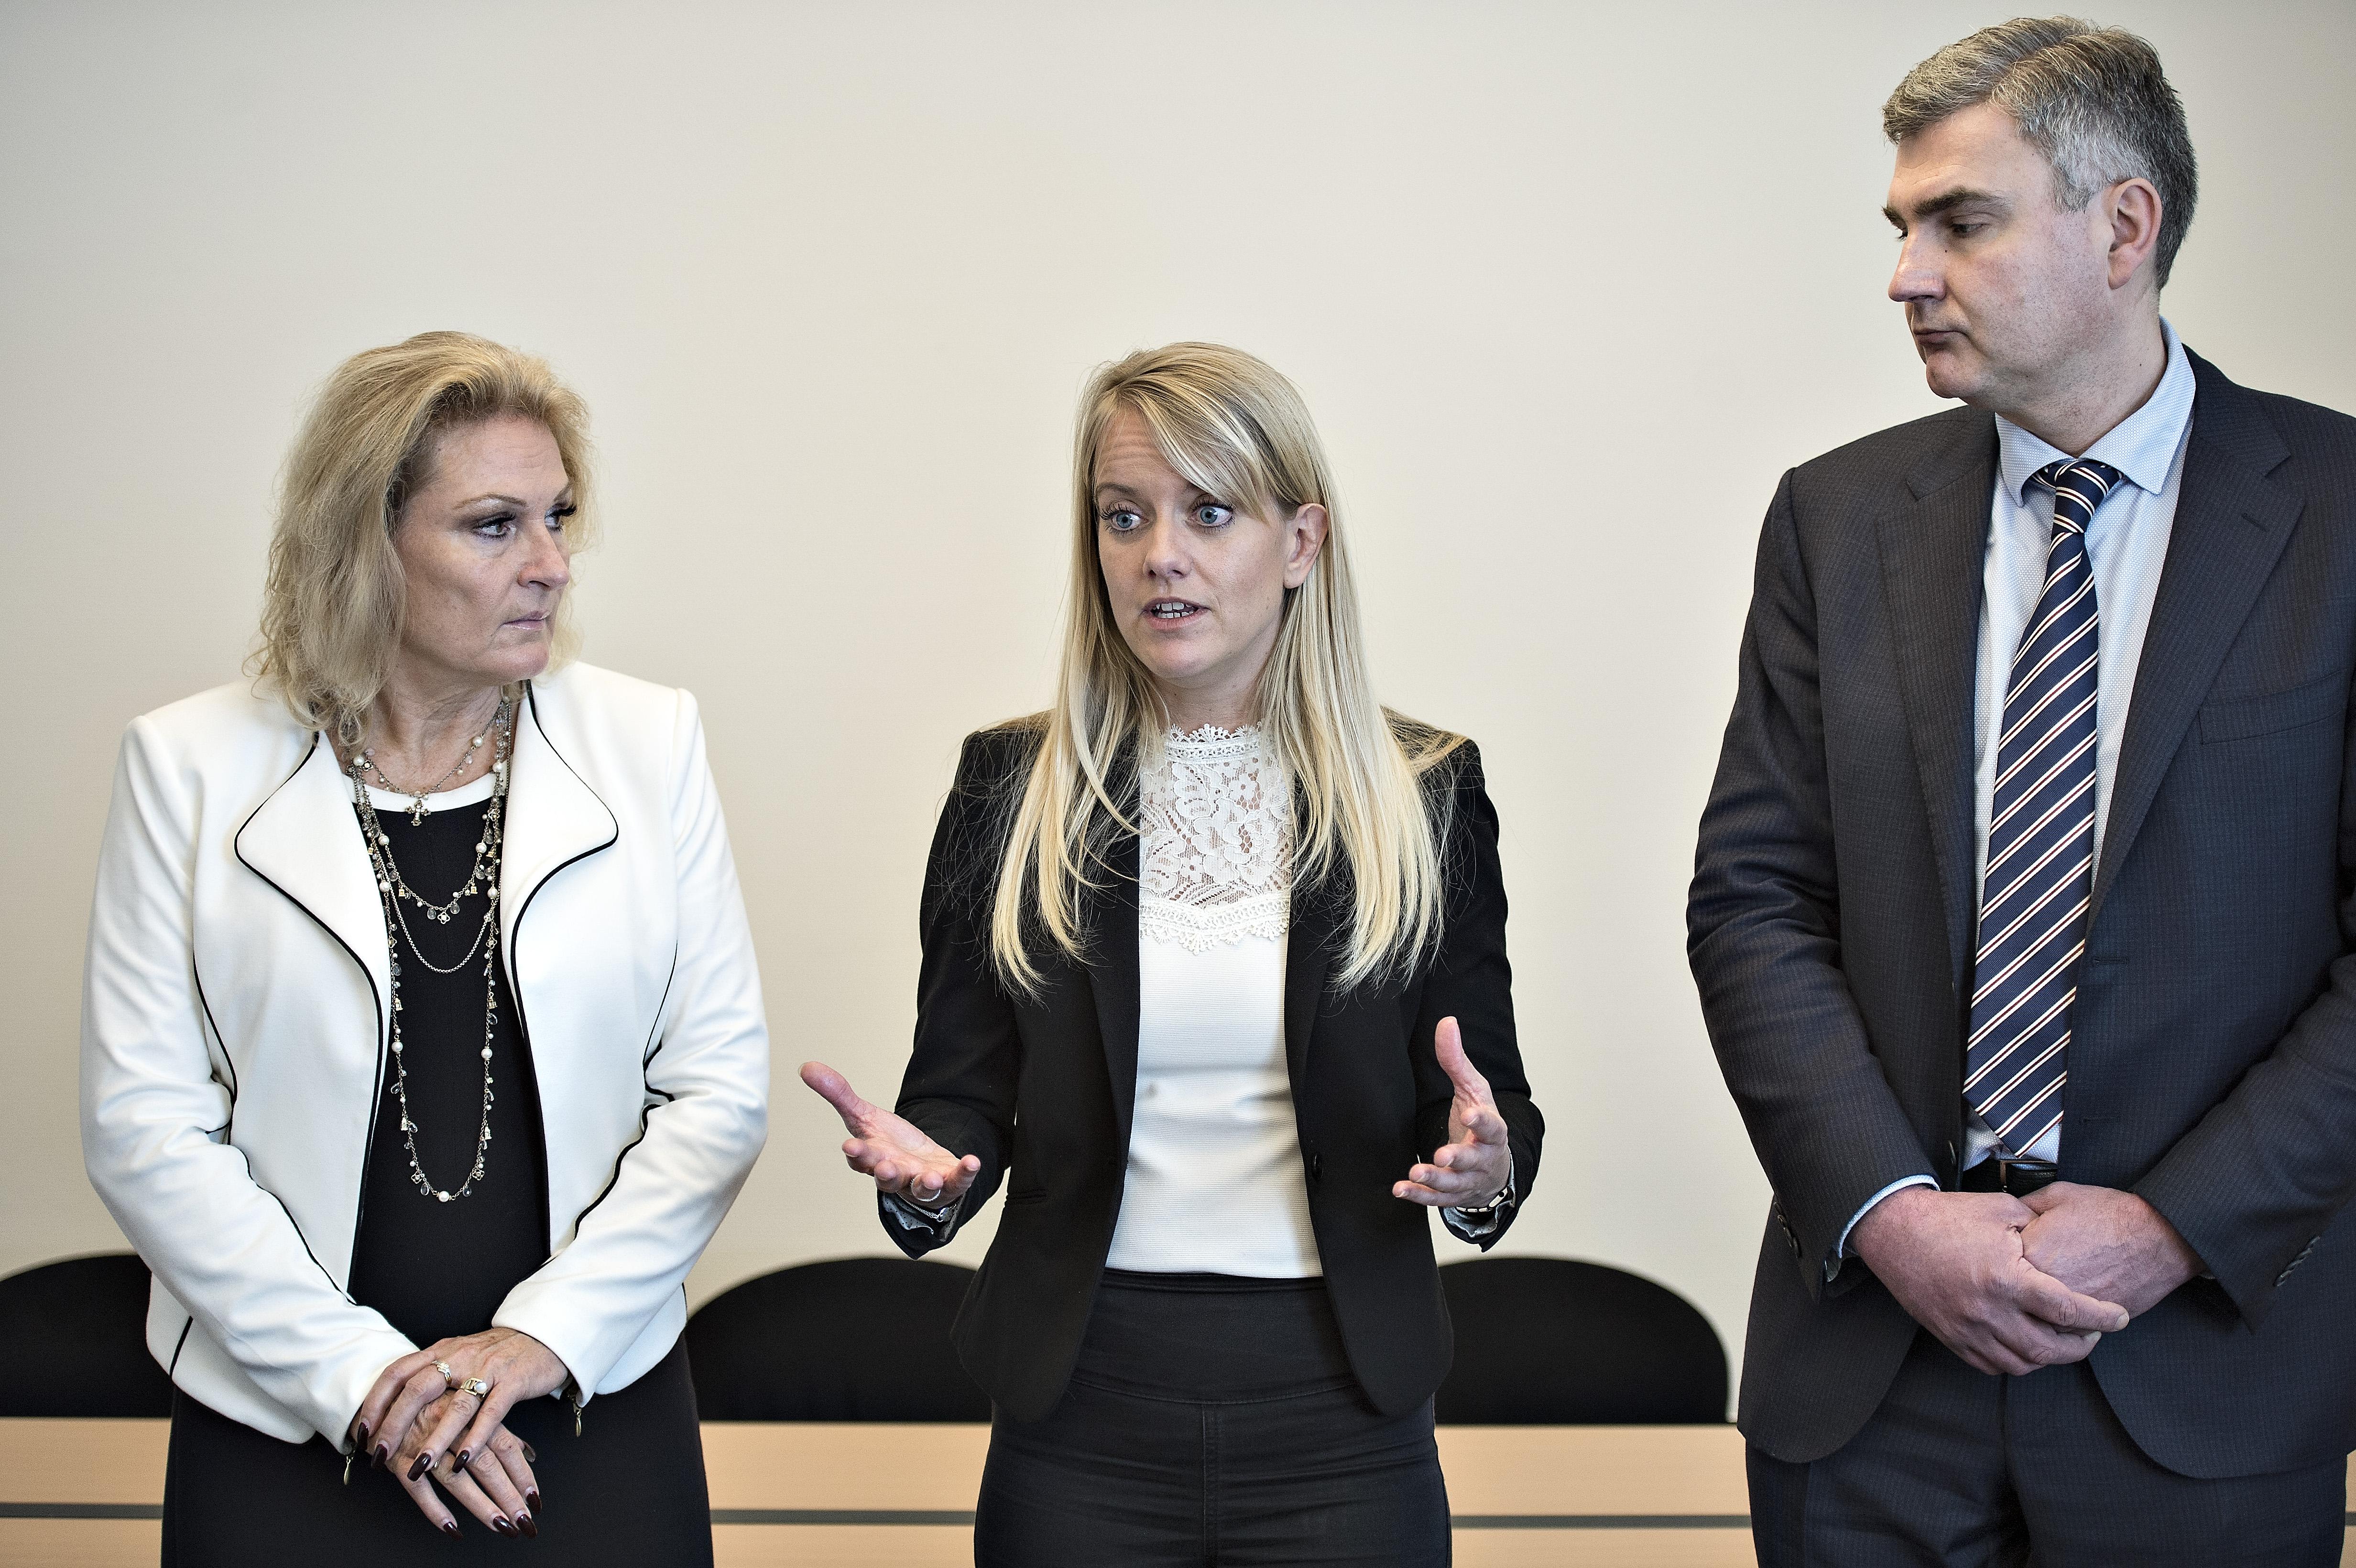 kriminel borger danske bryster